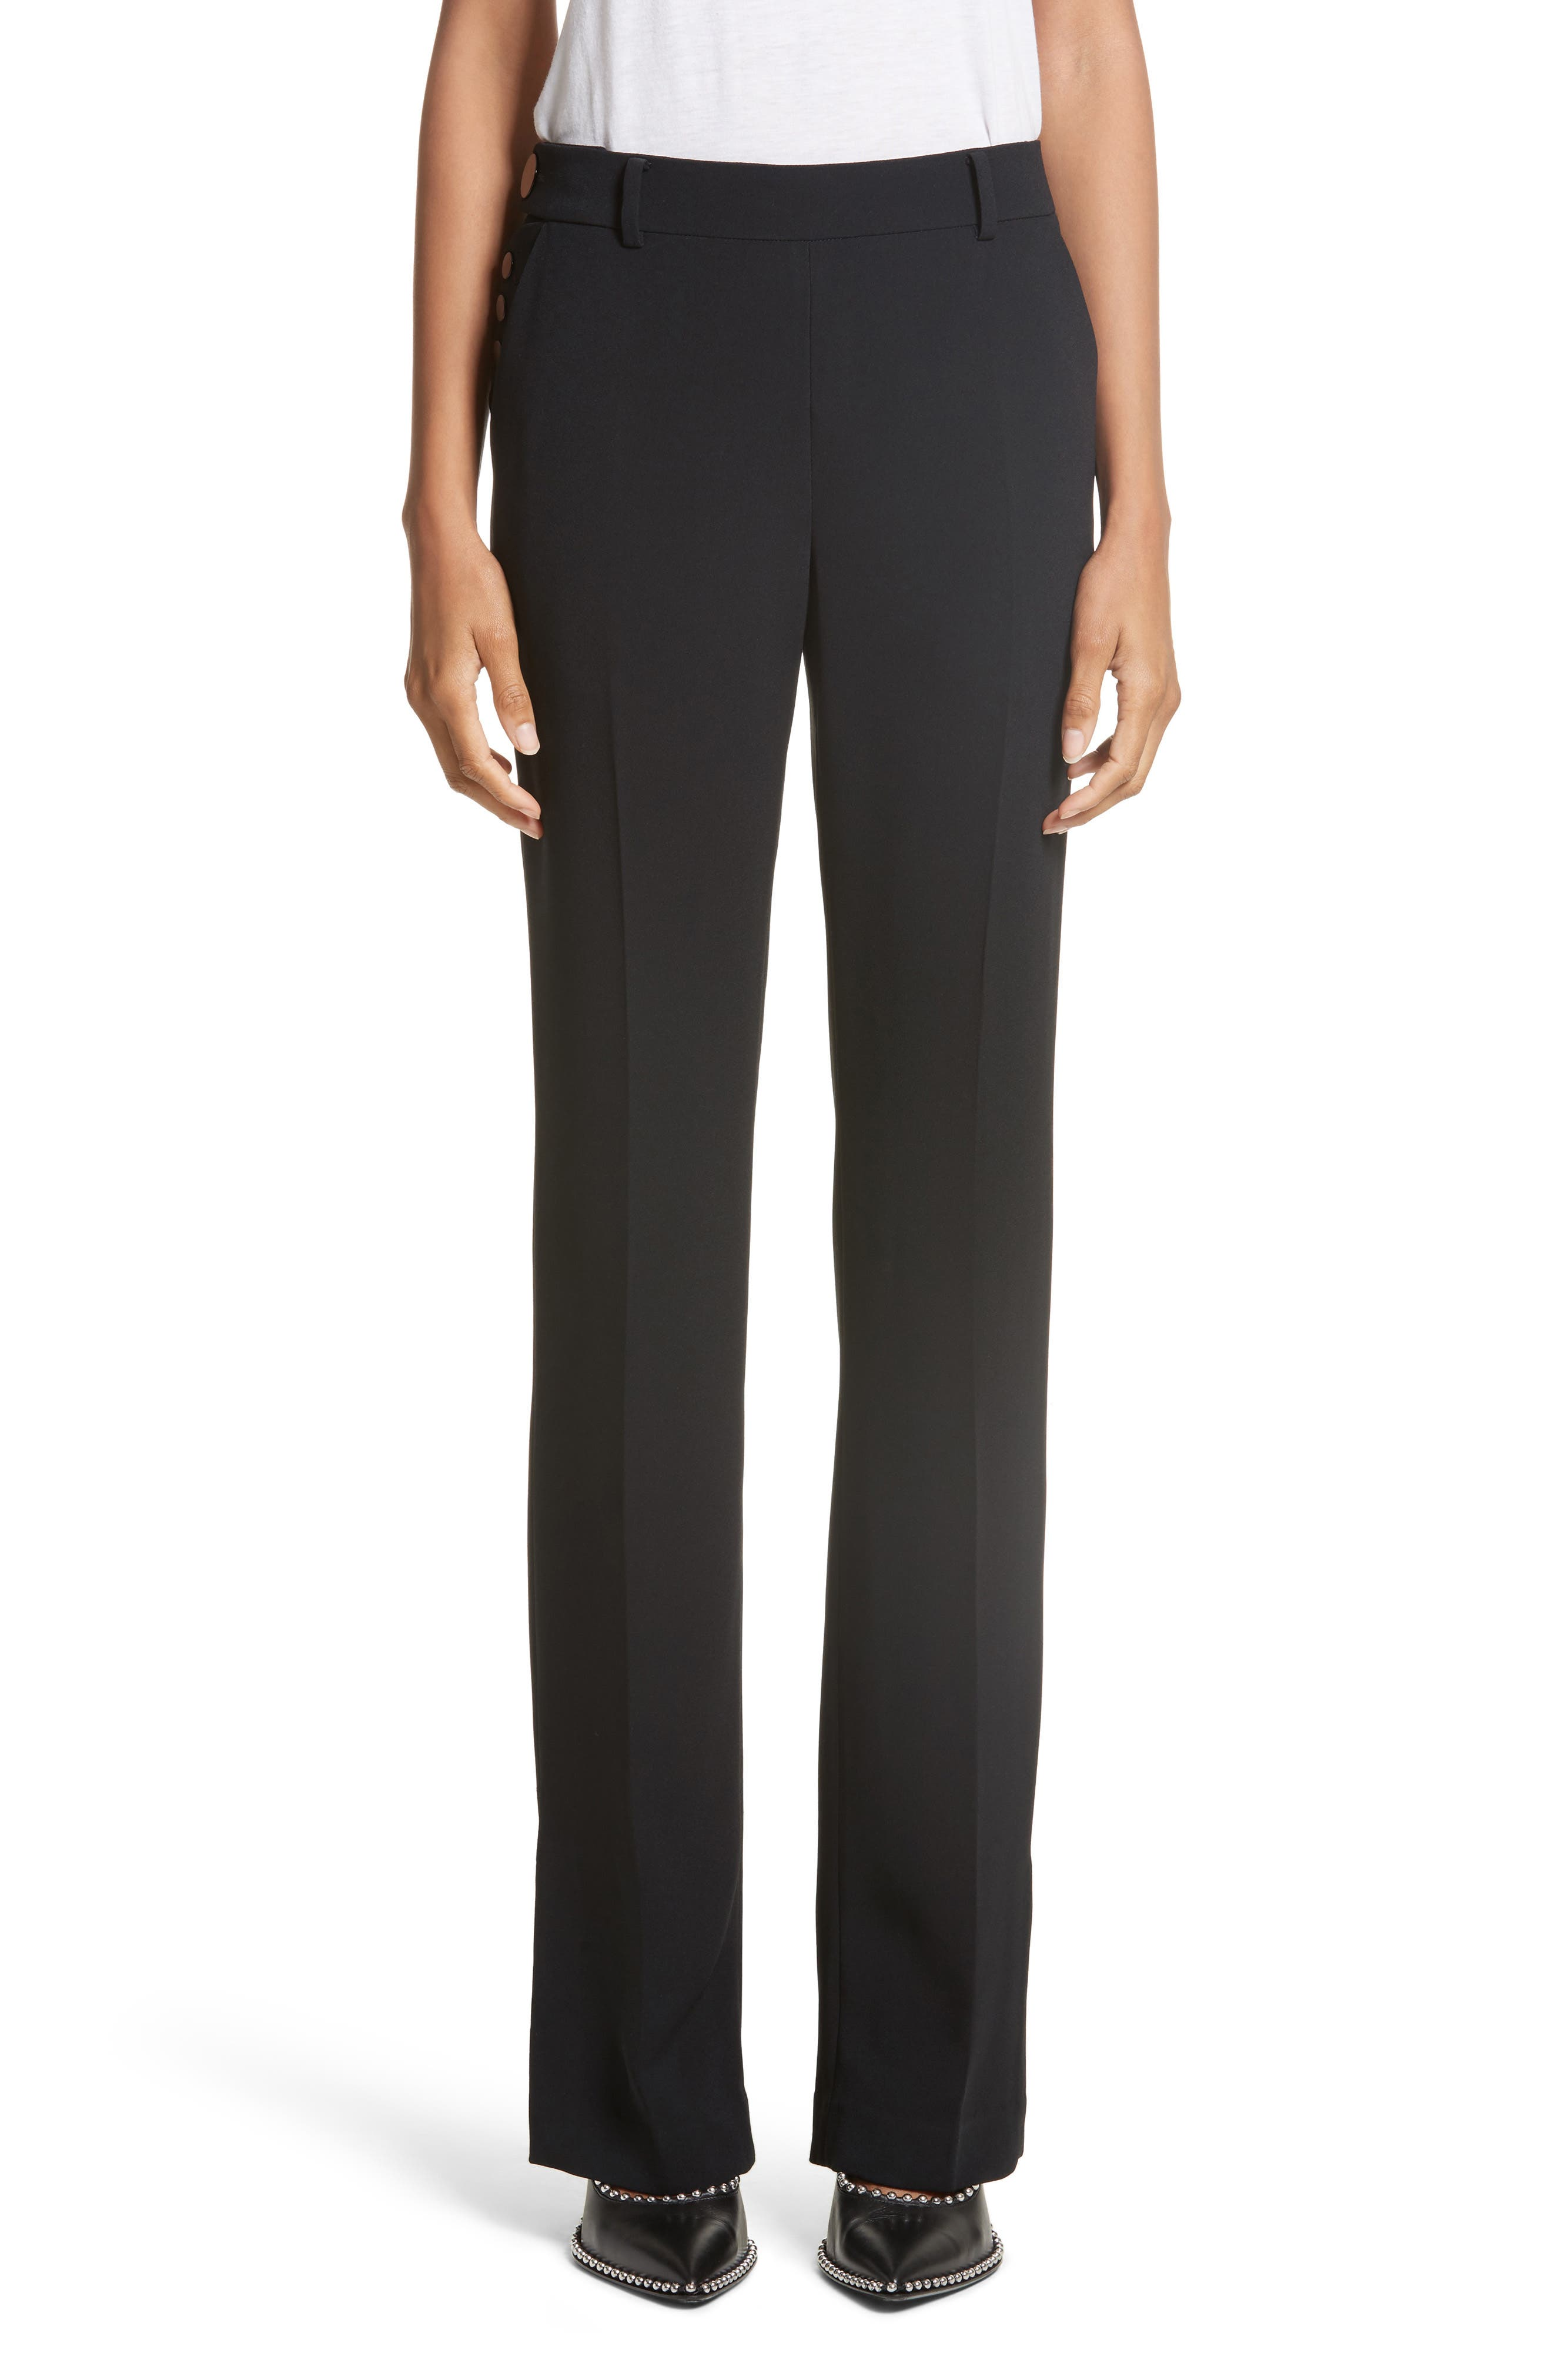 Alternate Image 1 Selected - Alexander Wang Side Snap Bootcut Pants